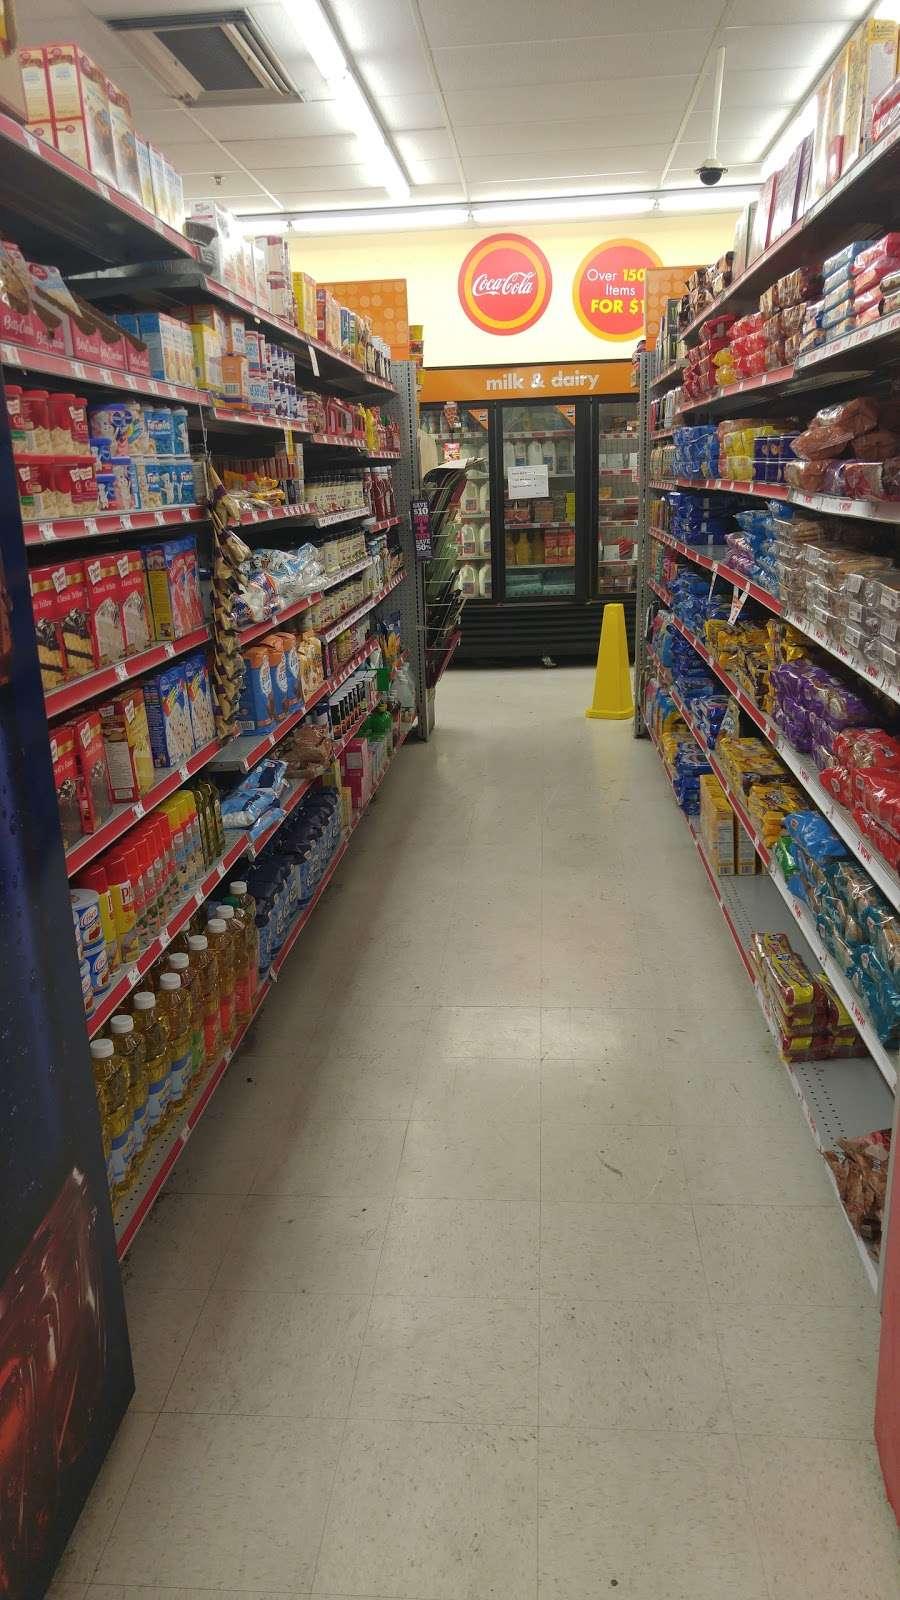 Family Dollar - supermarket  | Photo 2 of 4 | Address: 5648 Lancaster Ave Ste 15, Philadelphia, PA 19131, USA | Phone: (215) 877-2907